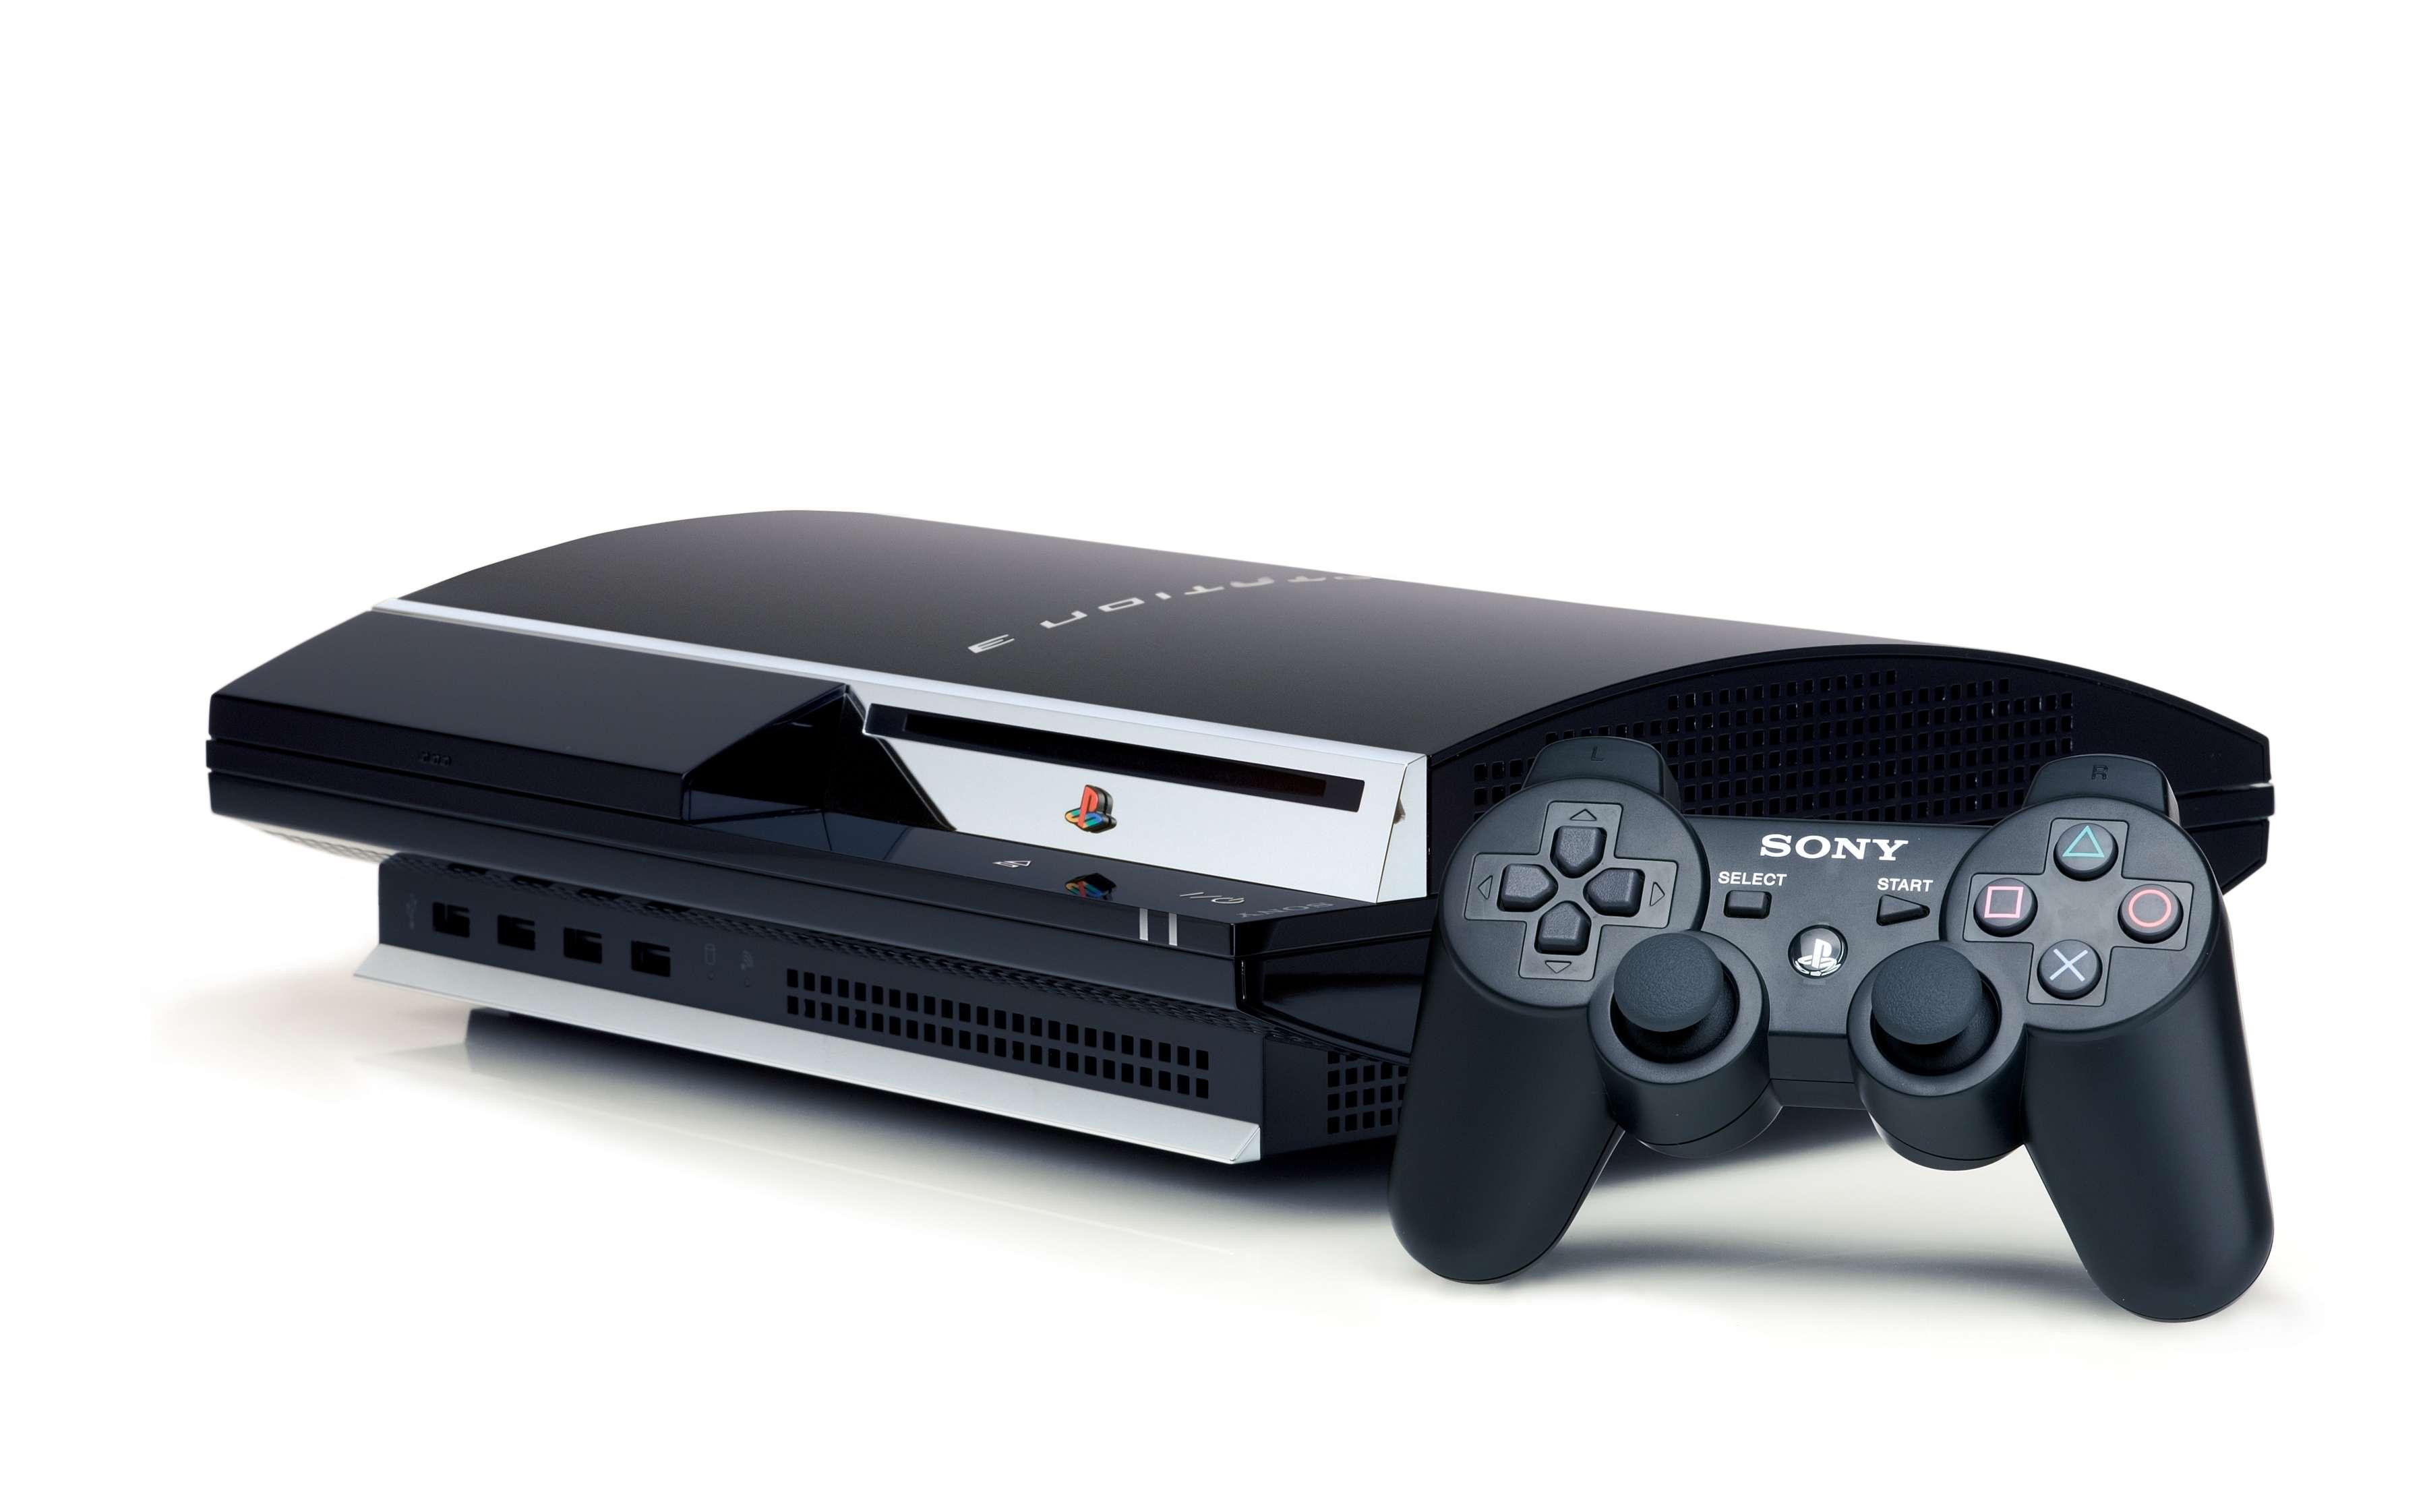 Tipe Konsol Playstation 3 Paling Bagus Review Game Sony Ps3 Super Slim 500gb Hitam Fat Merupakan Console Pertama Keluaran Untuk Jenis Ini Mempunyai Kelemahan Yaitu Tingkat Panas Mesin Yang Tinggi Sehingga